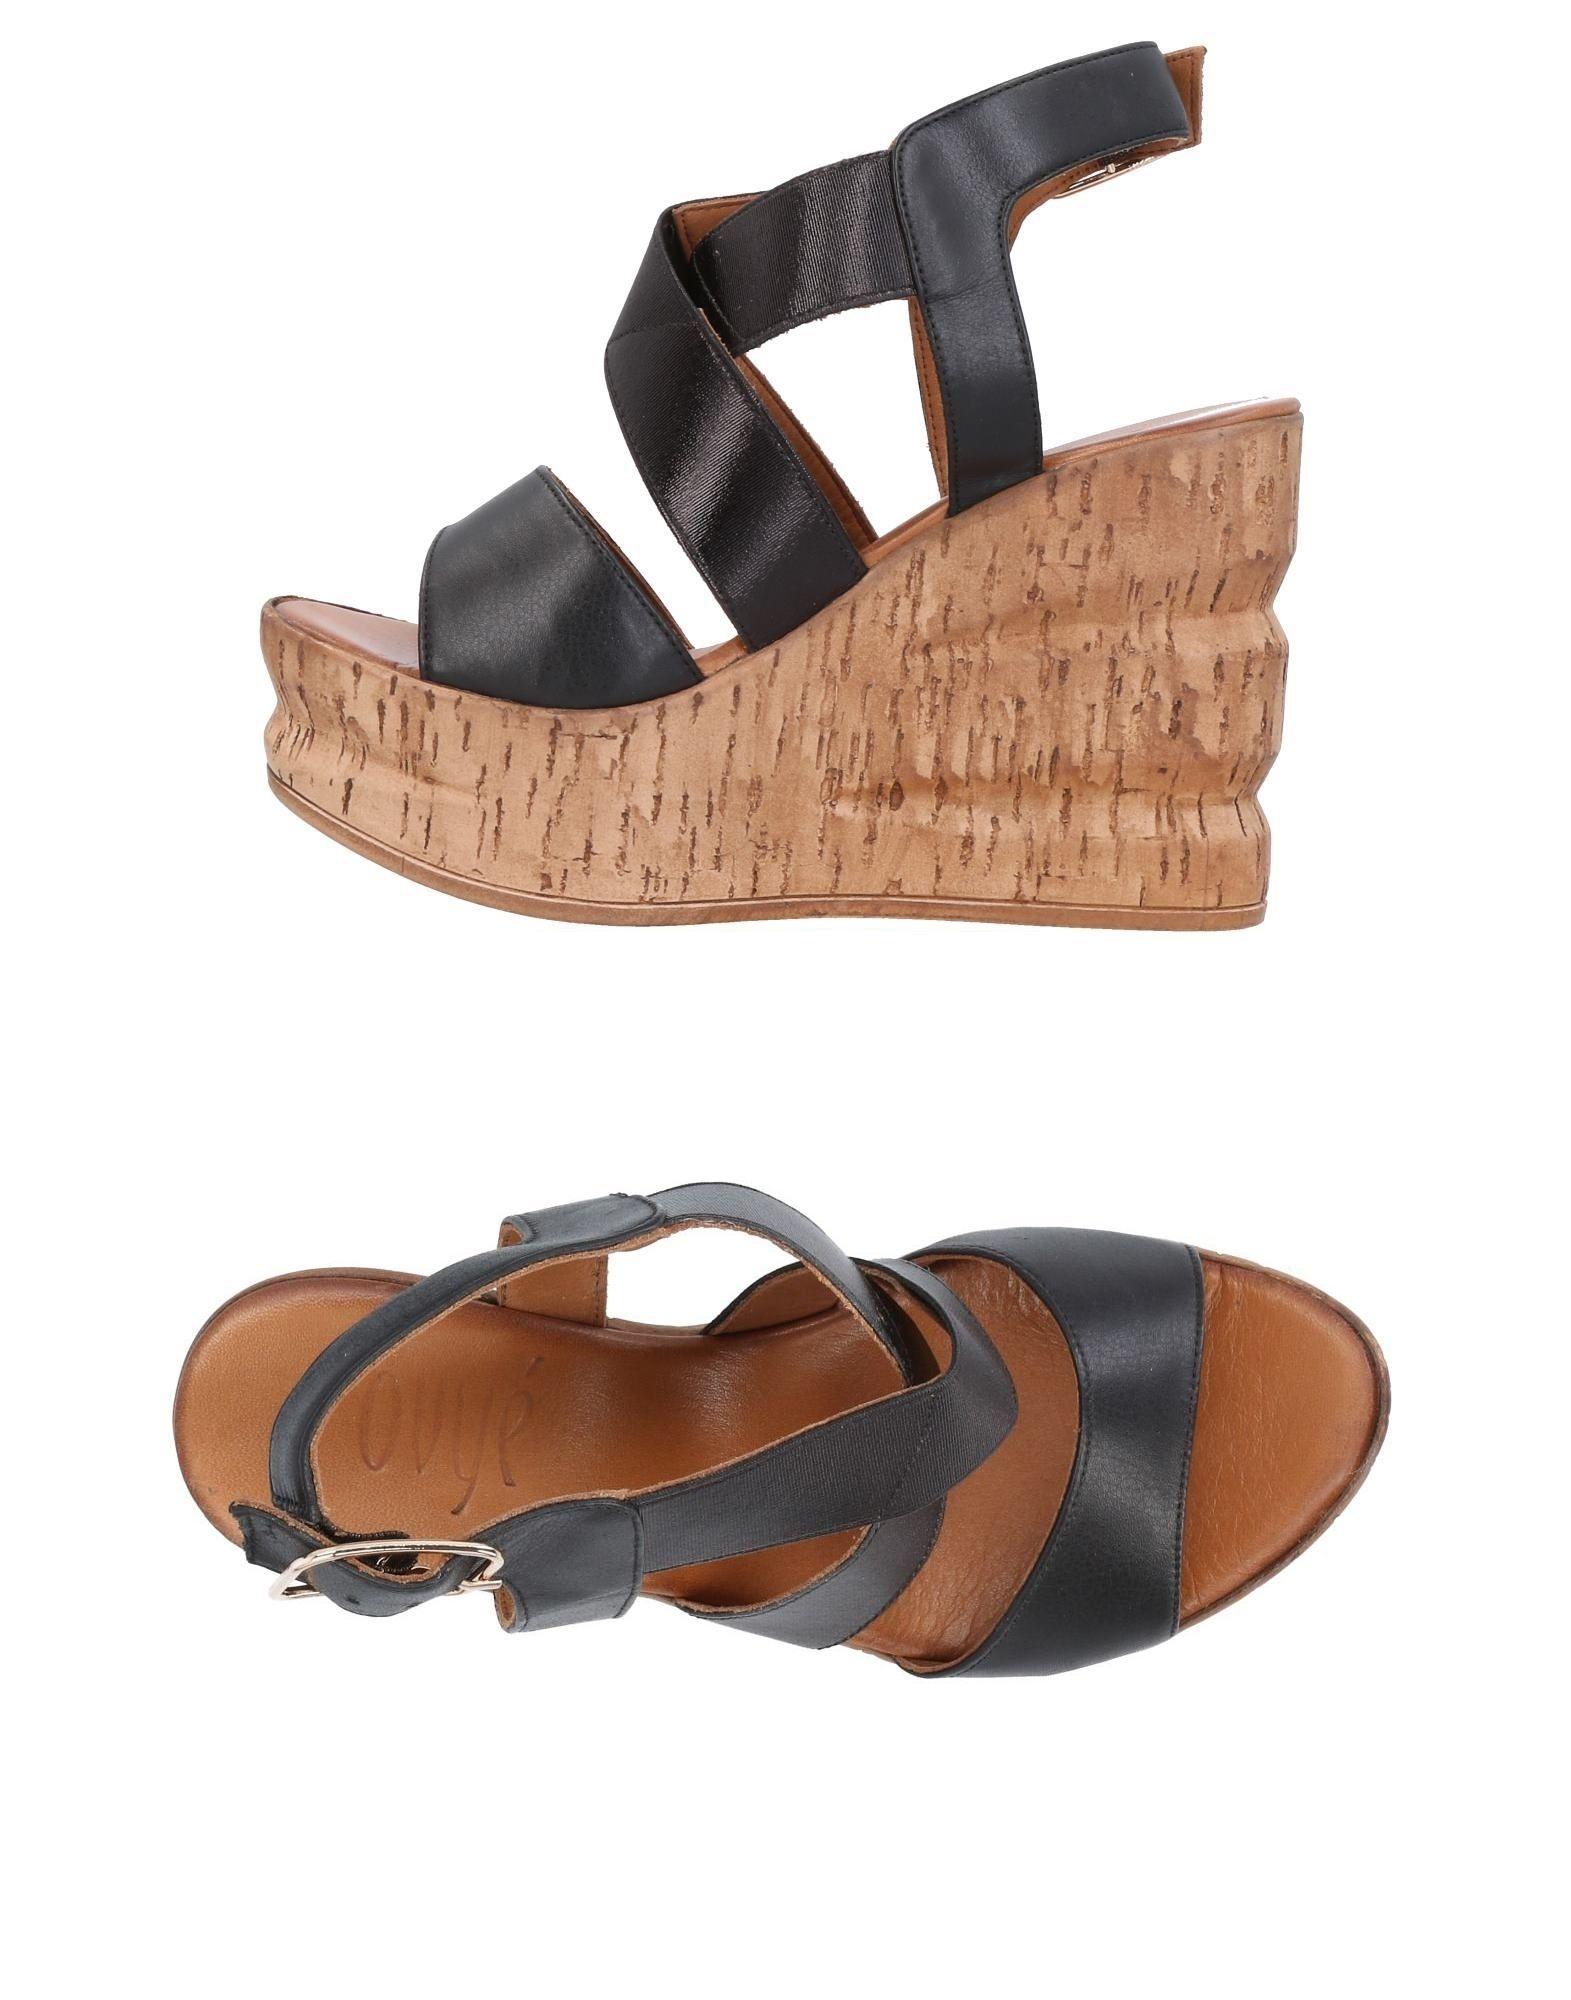 Chaussures - Sandales Post Orteils Ovye Par Cristina Lucchi 4ckJxzSgo